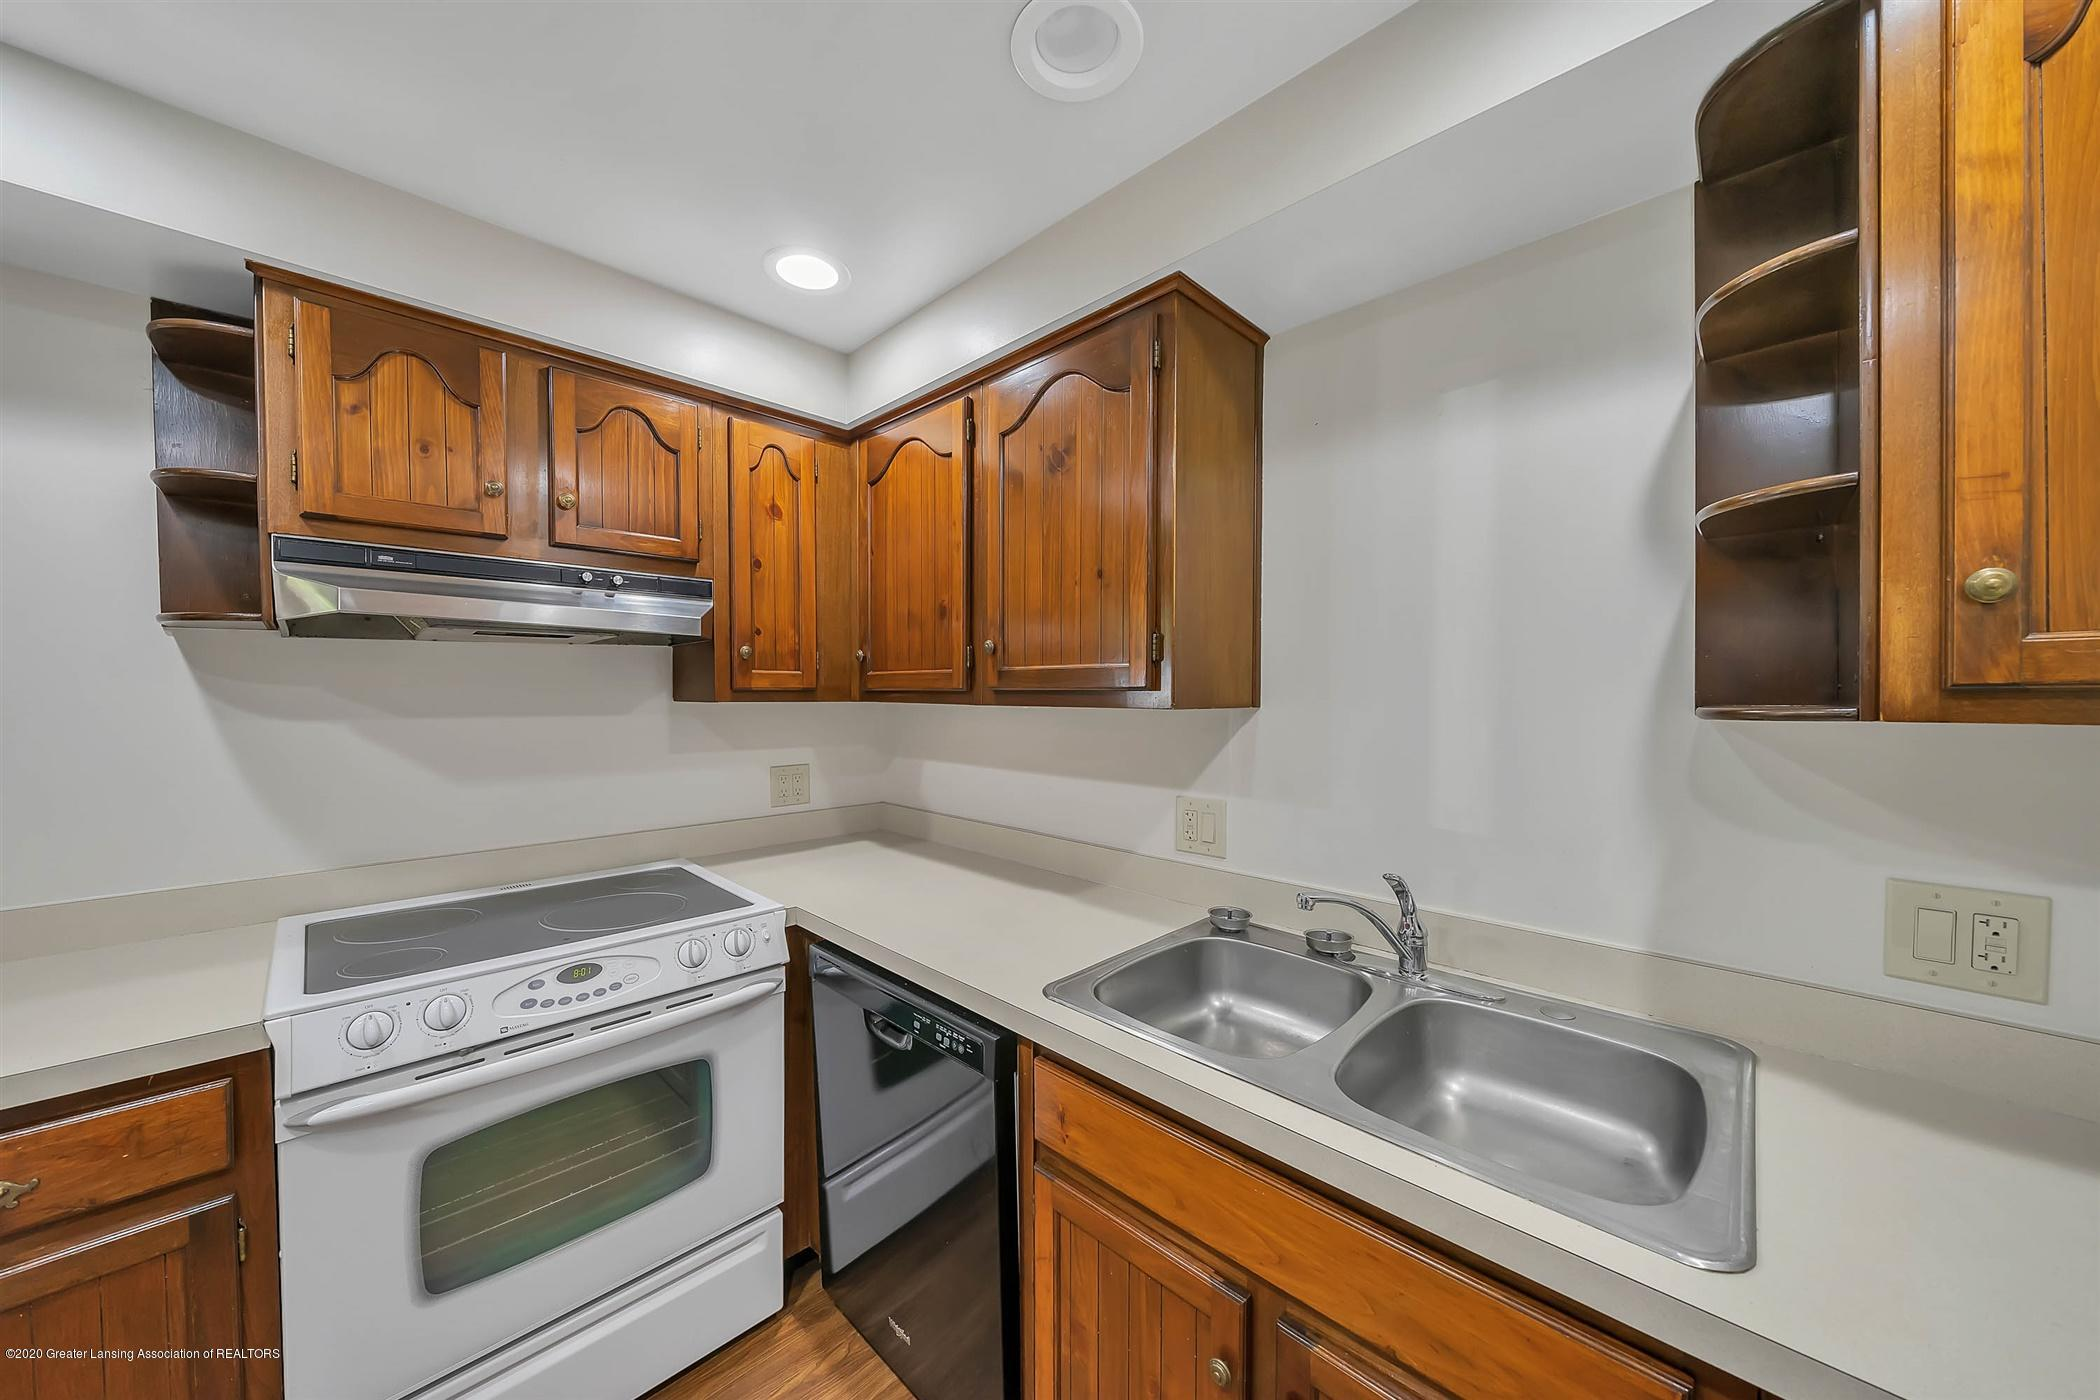 6750 W Lovejoy Rd - (9) 6750 Lovejoy Kitchen - 9